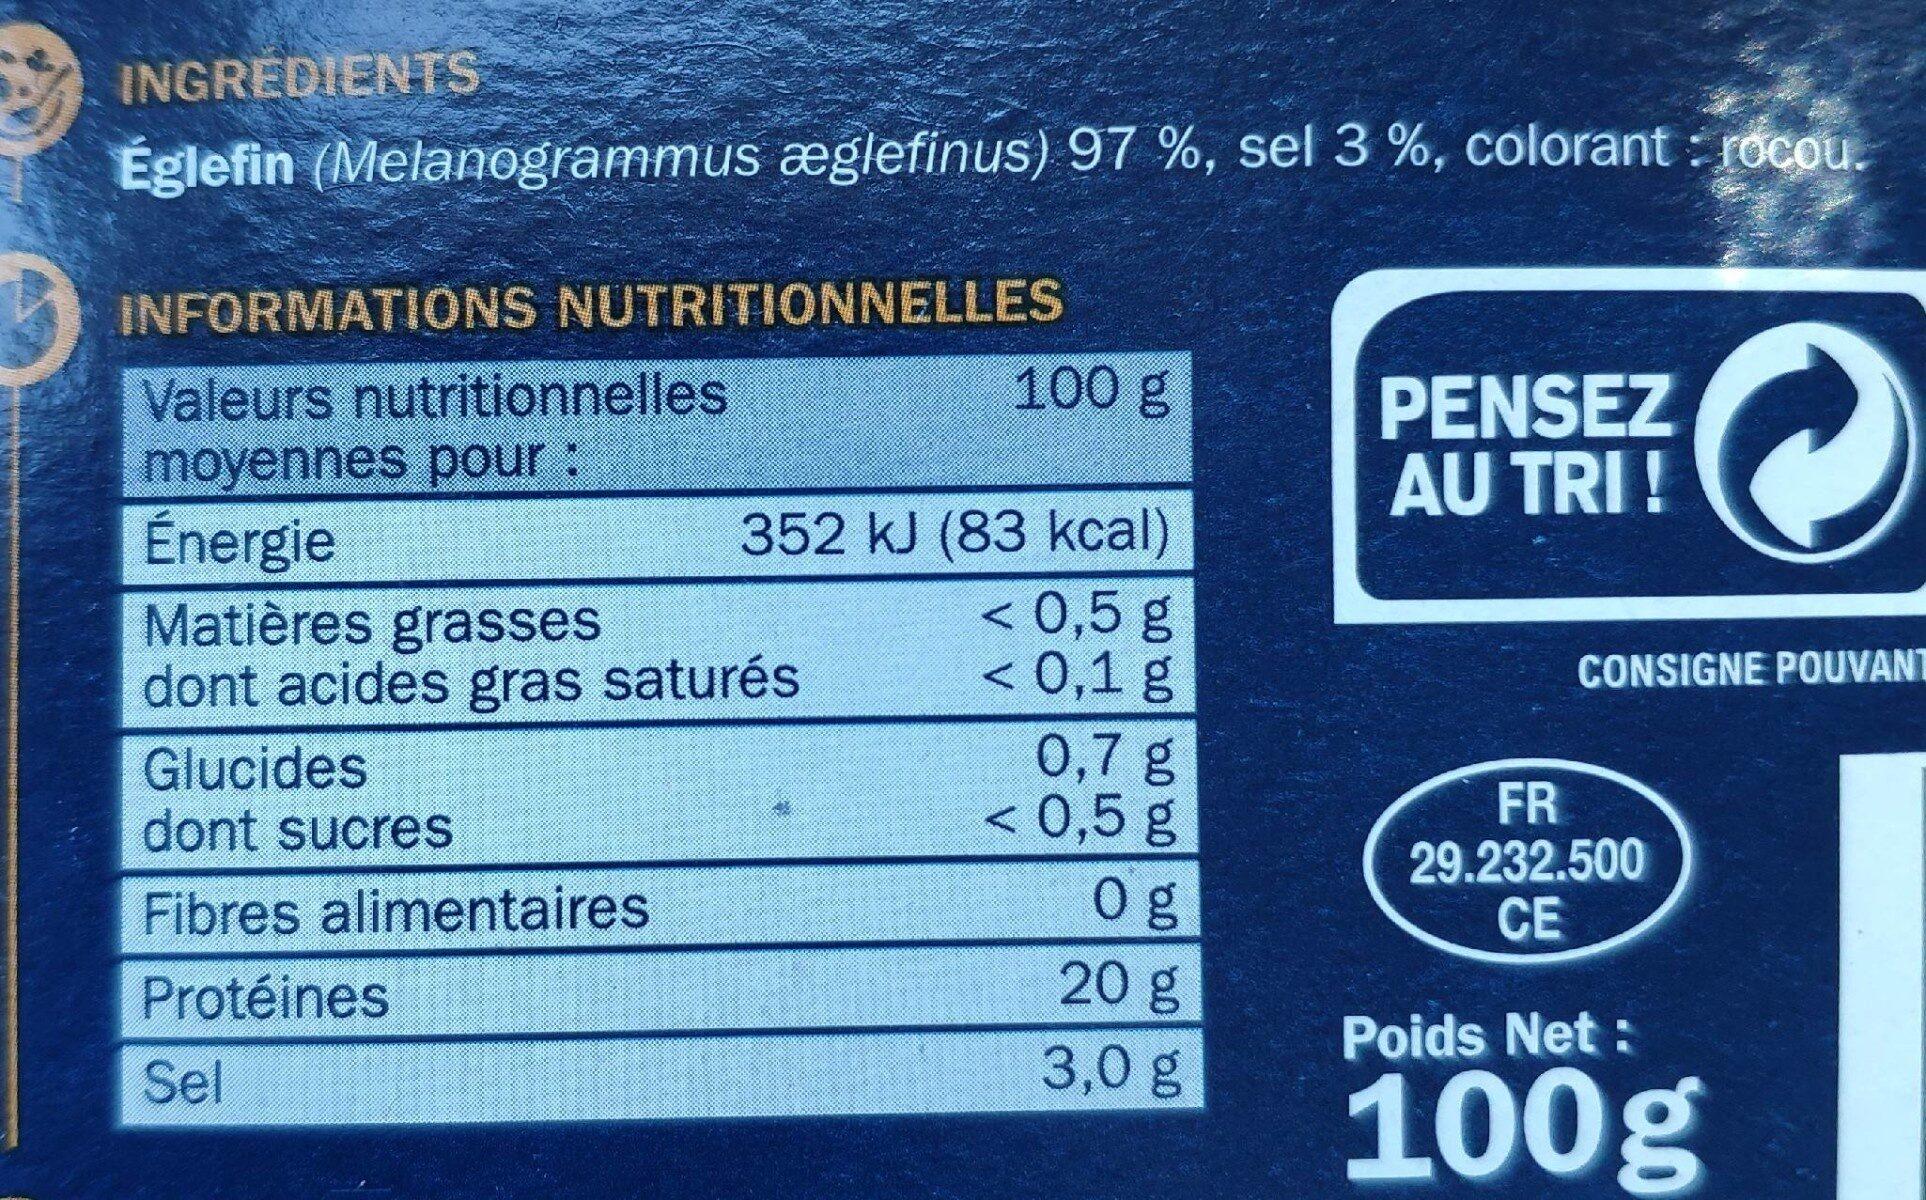 Emincés de haddock - Informations nutritionnelles - fr